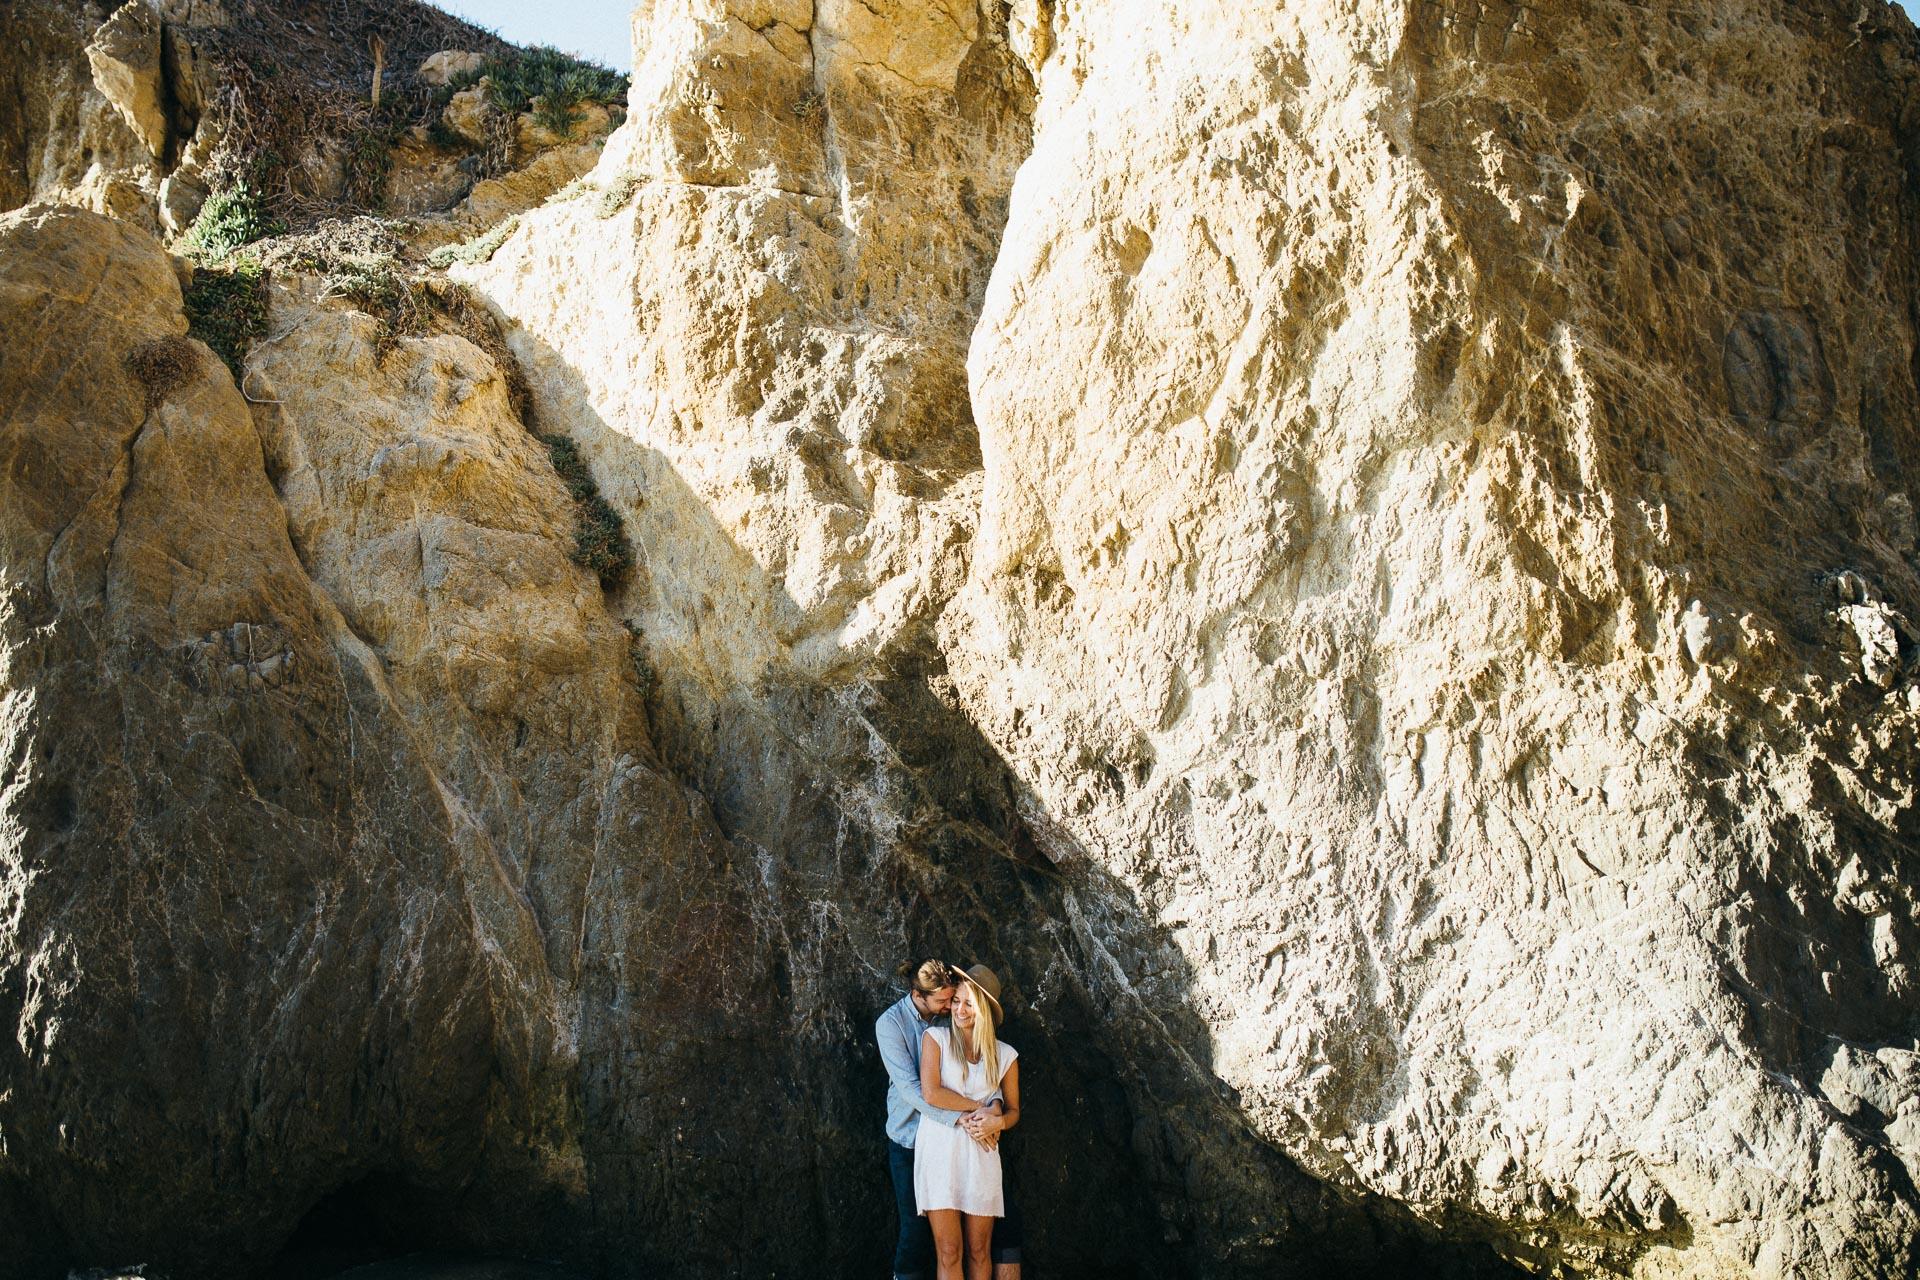 Carley_Jake_Lovesession_California_LosAngeles_ElMatadorBeach_JeanLaurentGaudy_001-4